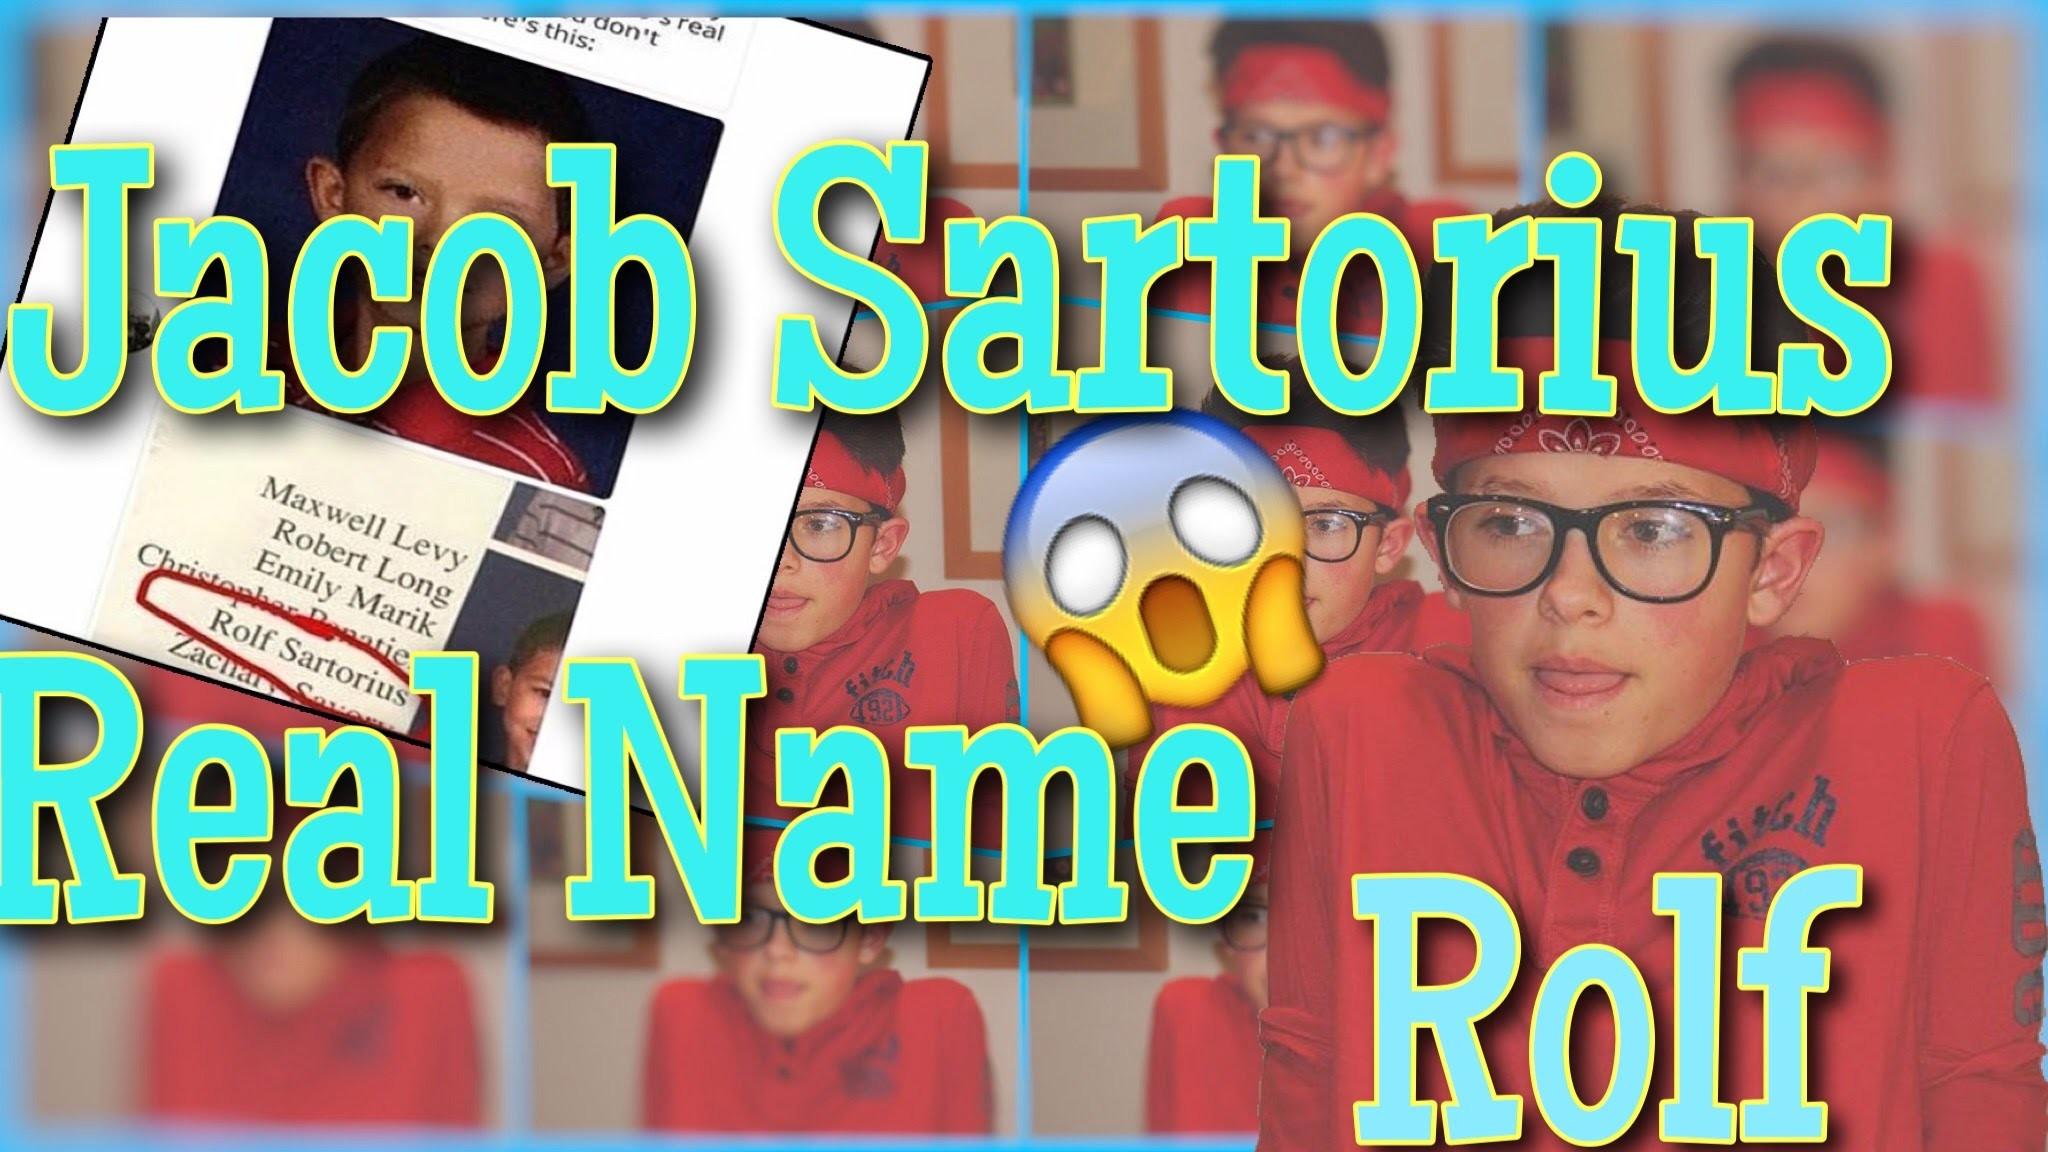 Jacob Sartorius Real Name…Rolf?